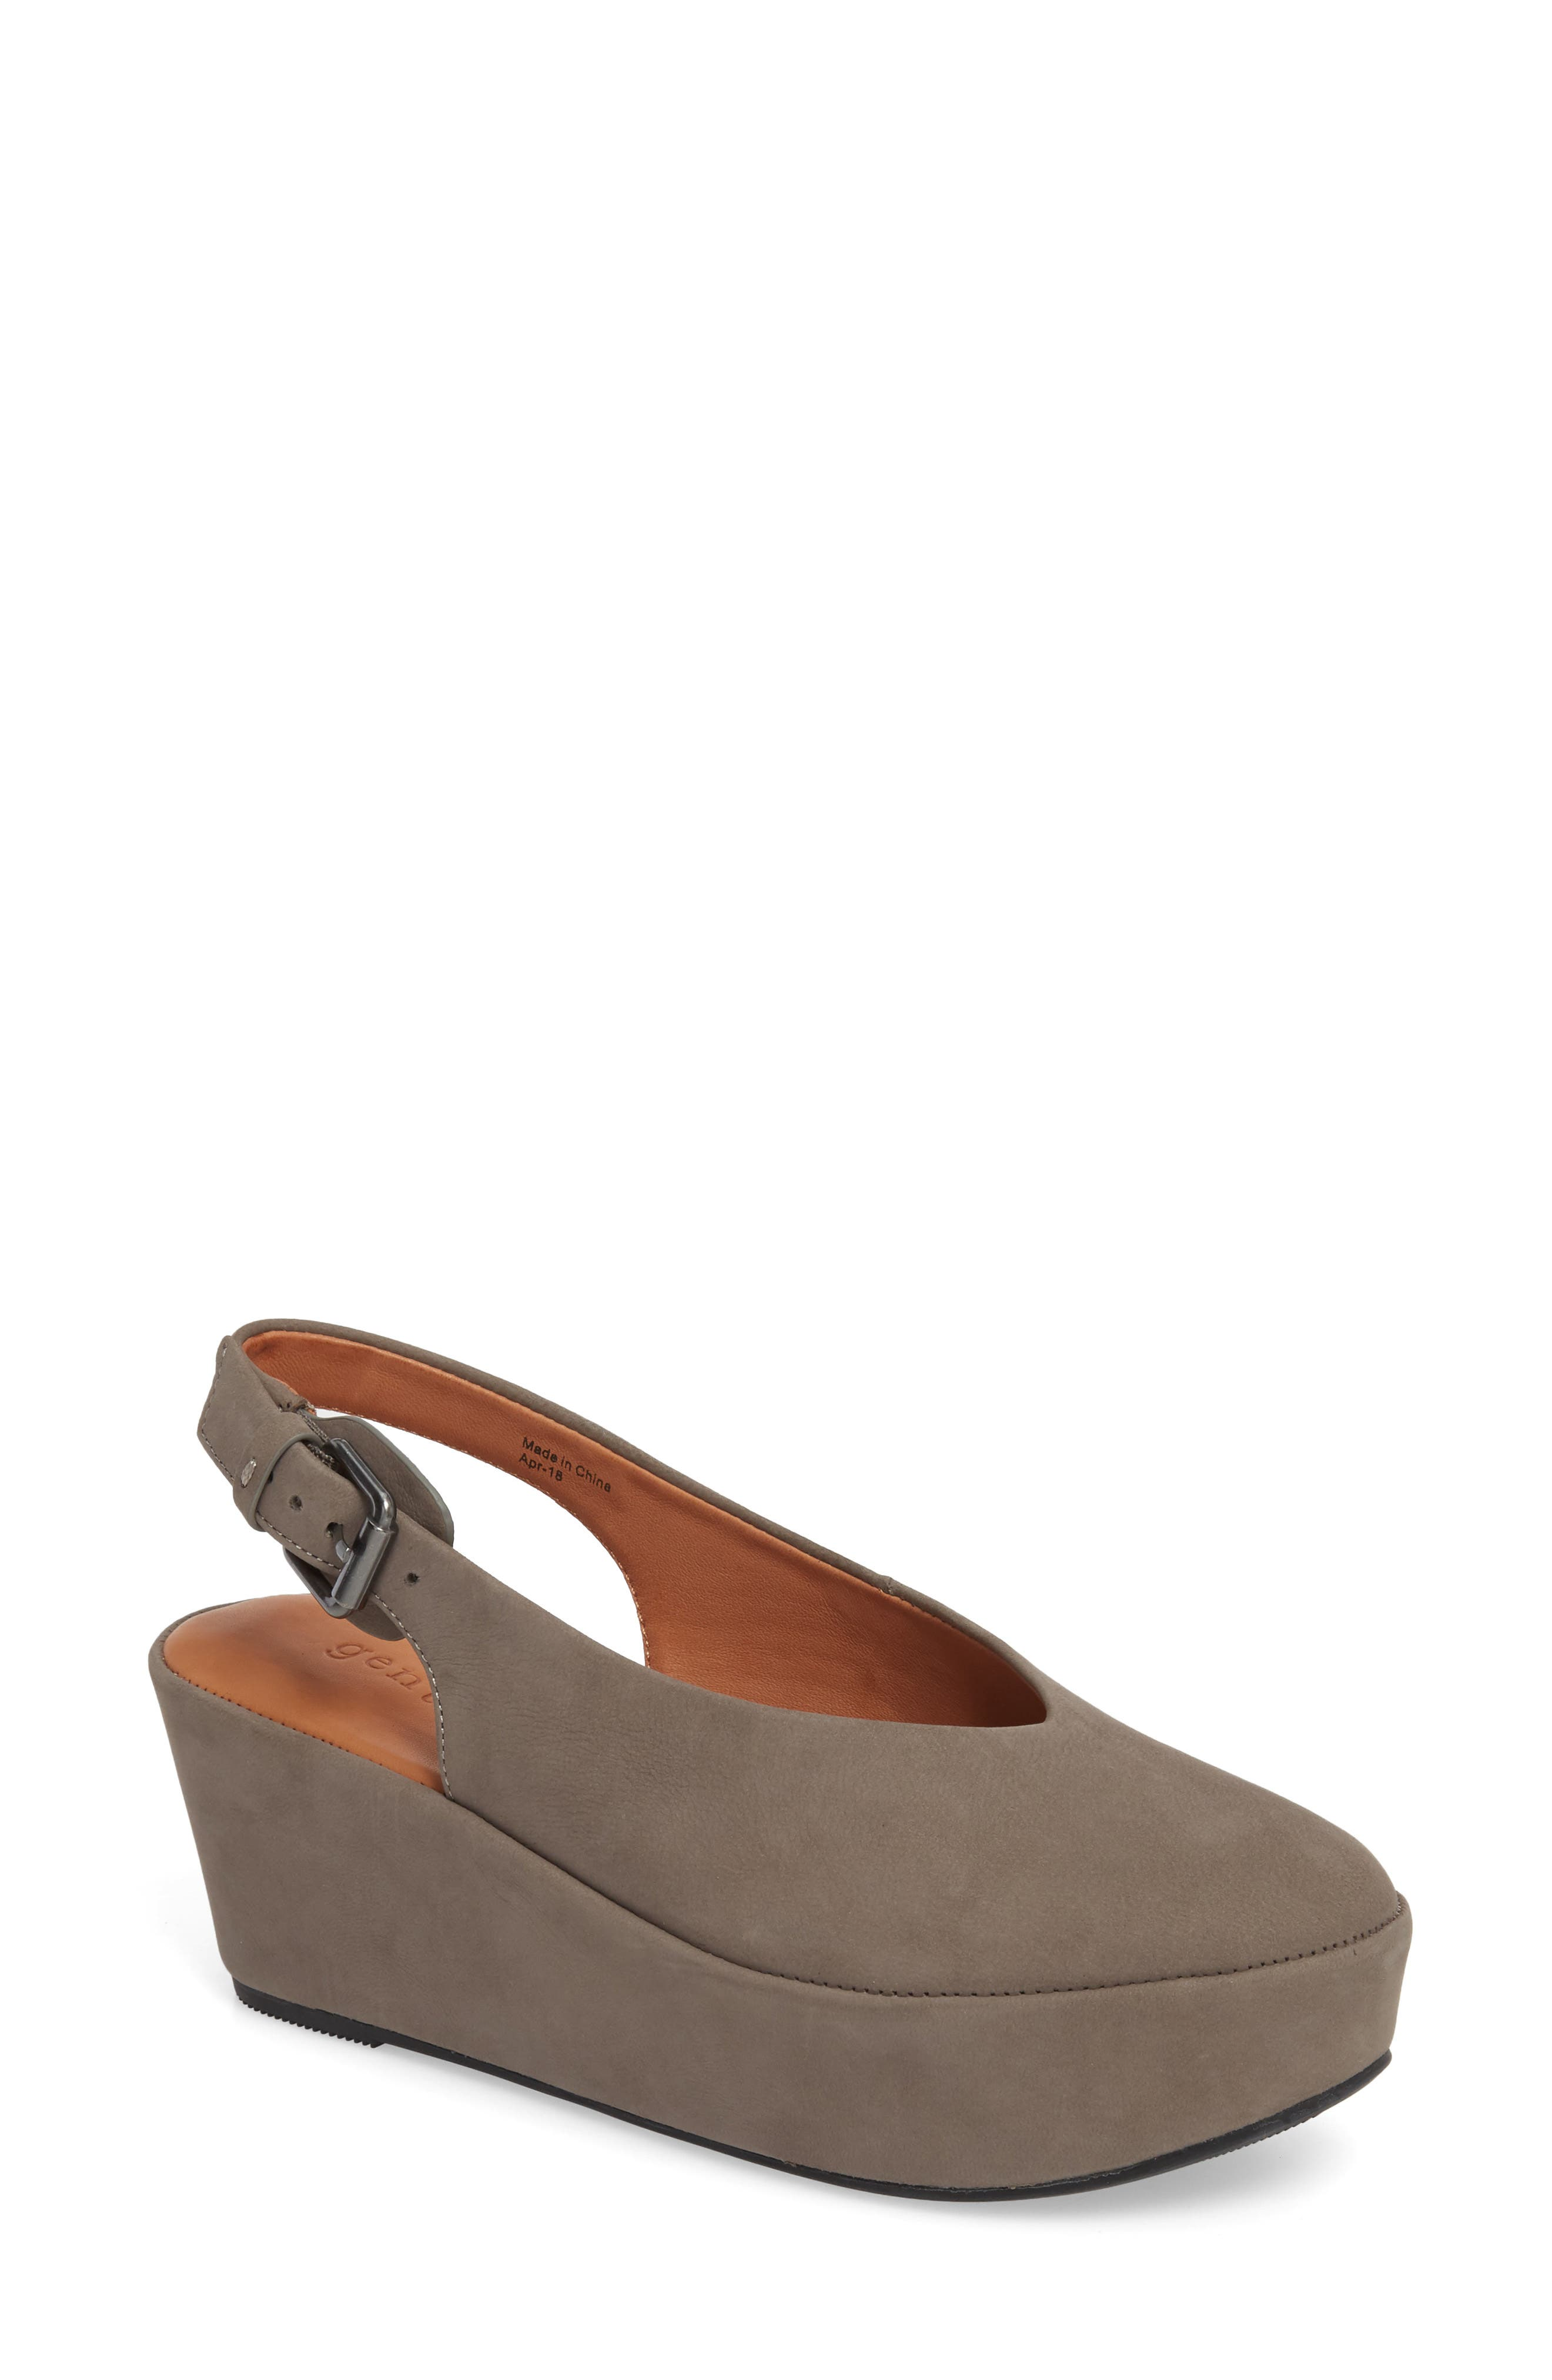 GENTLE SOULS BY KENNETH COLE Gentle Souls Nyomi Platform Sandal, Main, color, ELEPHANT NUBUCK